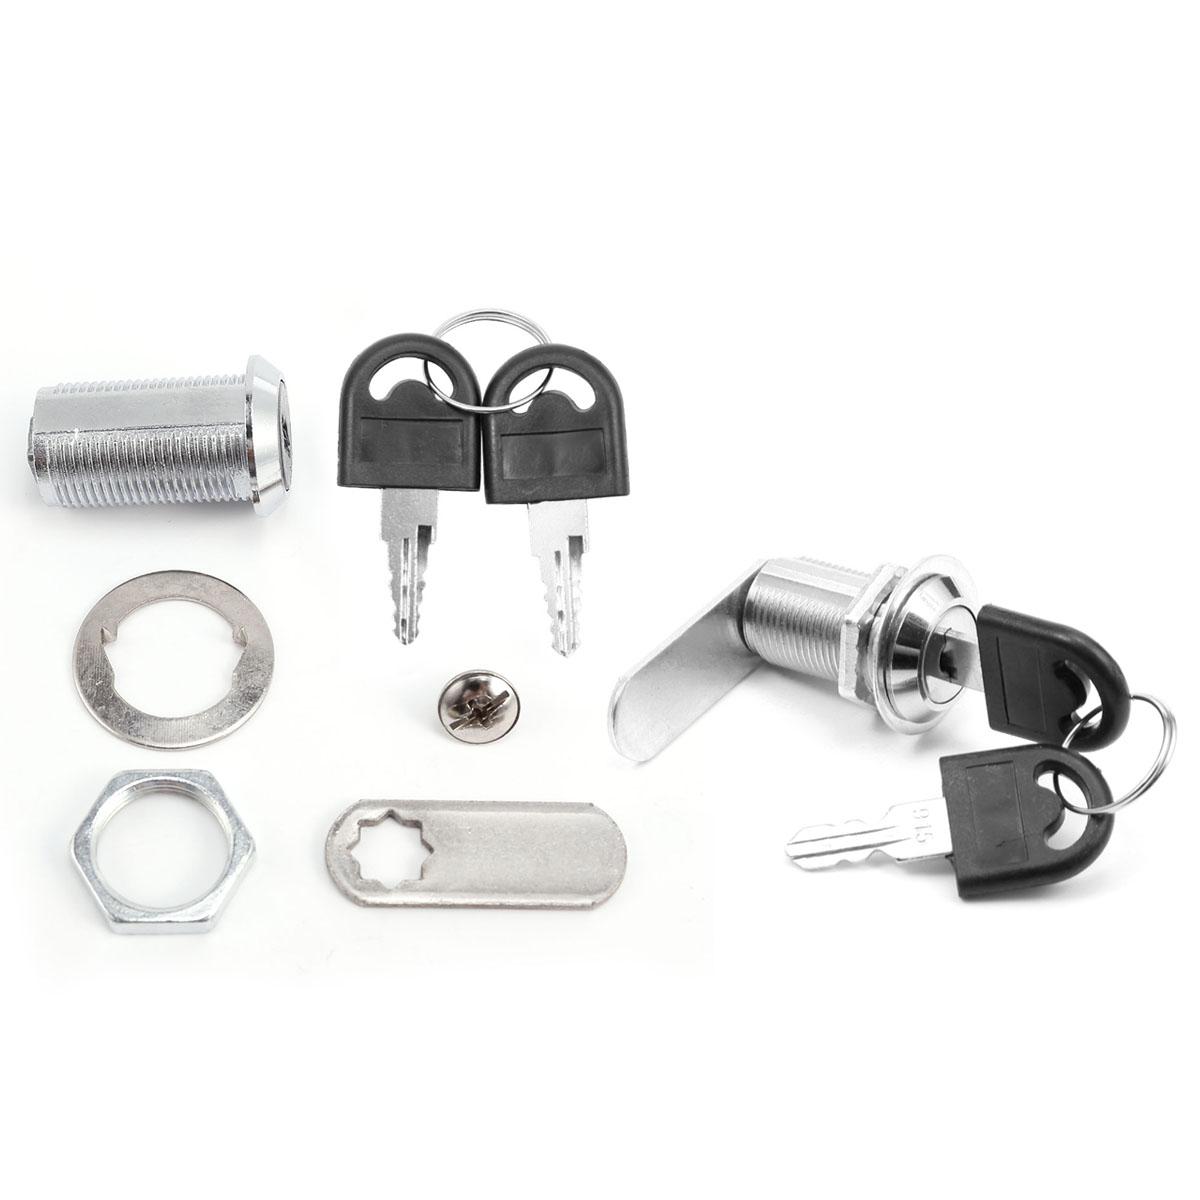 20mm 30mm Cam Lock Cylinder Barrel W Keys For Drawers ...